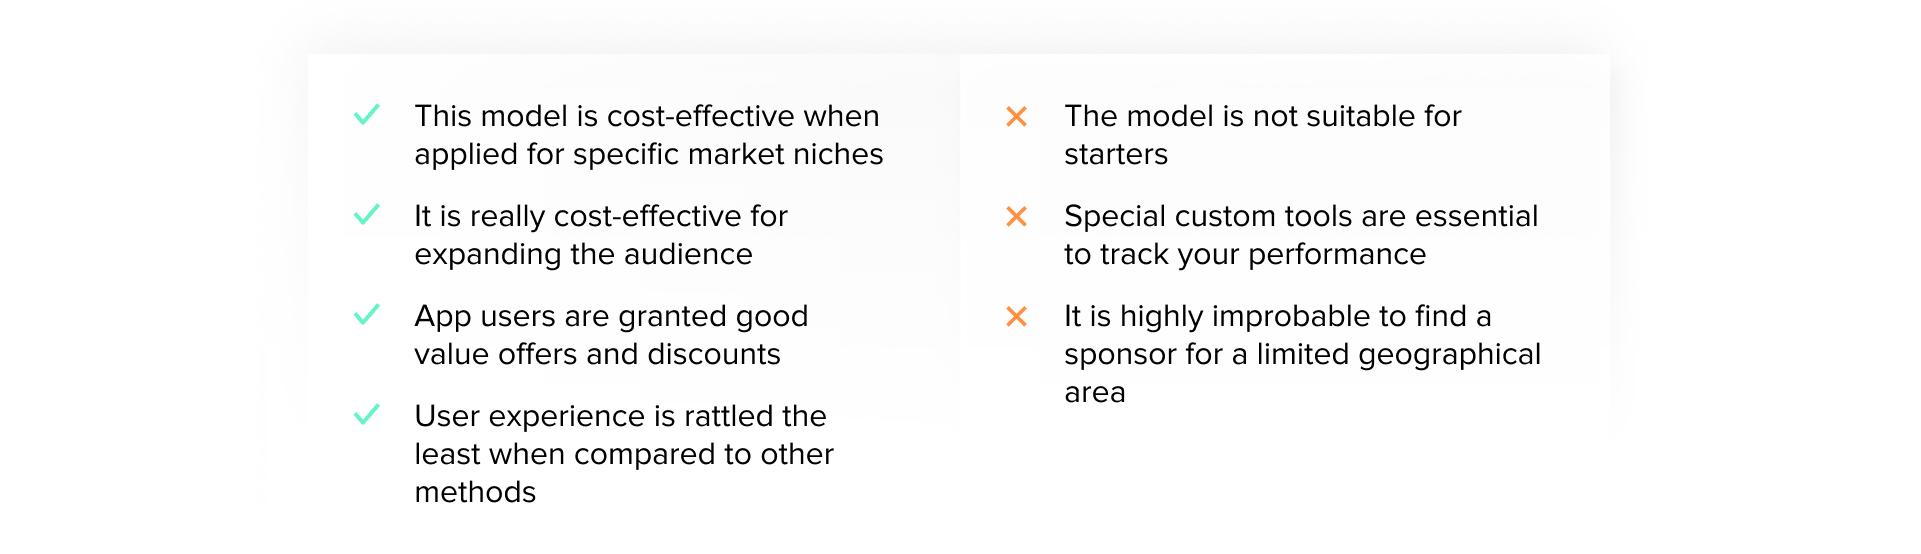 pros and cons of Sponsorship Model revenue monetization model